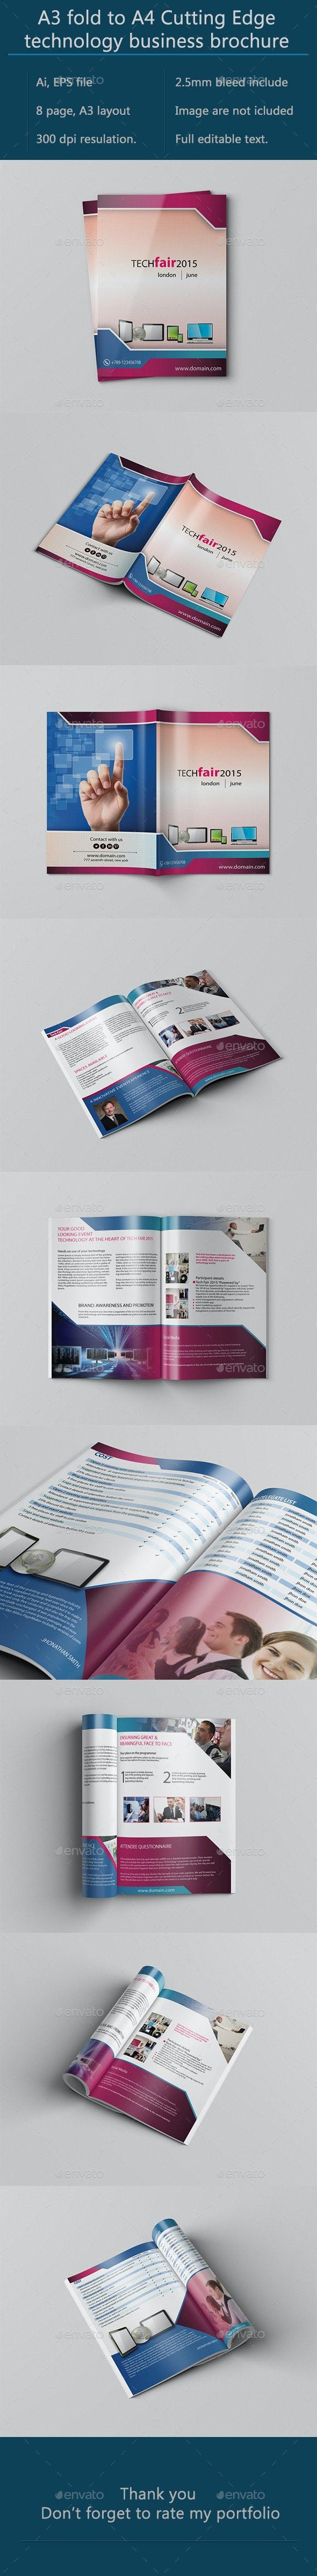 A3 Bifold Technology Brochure - Corporate Brochures